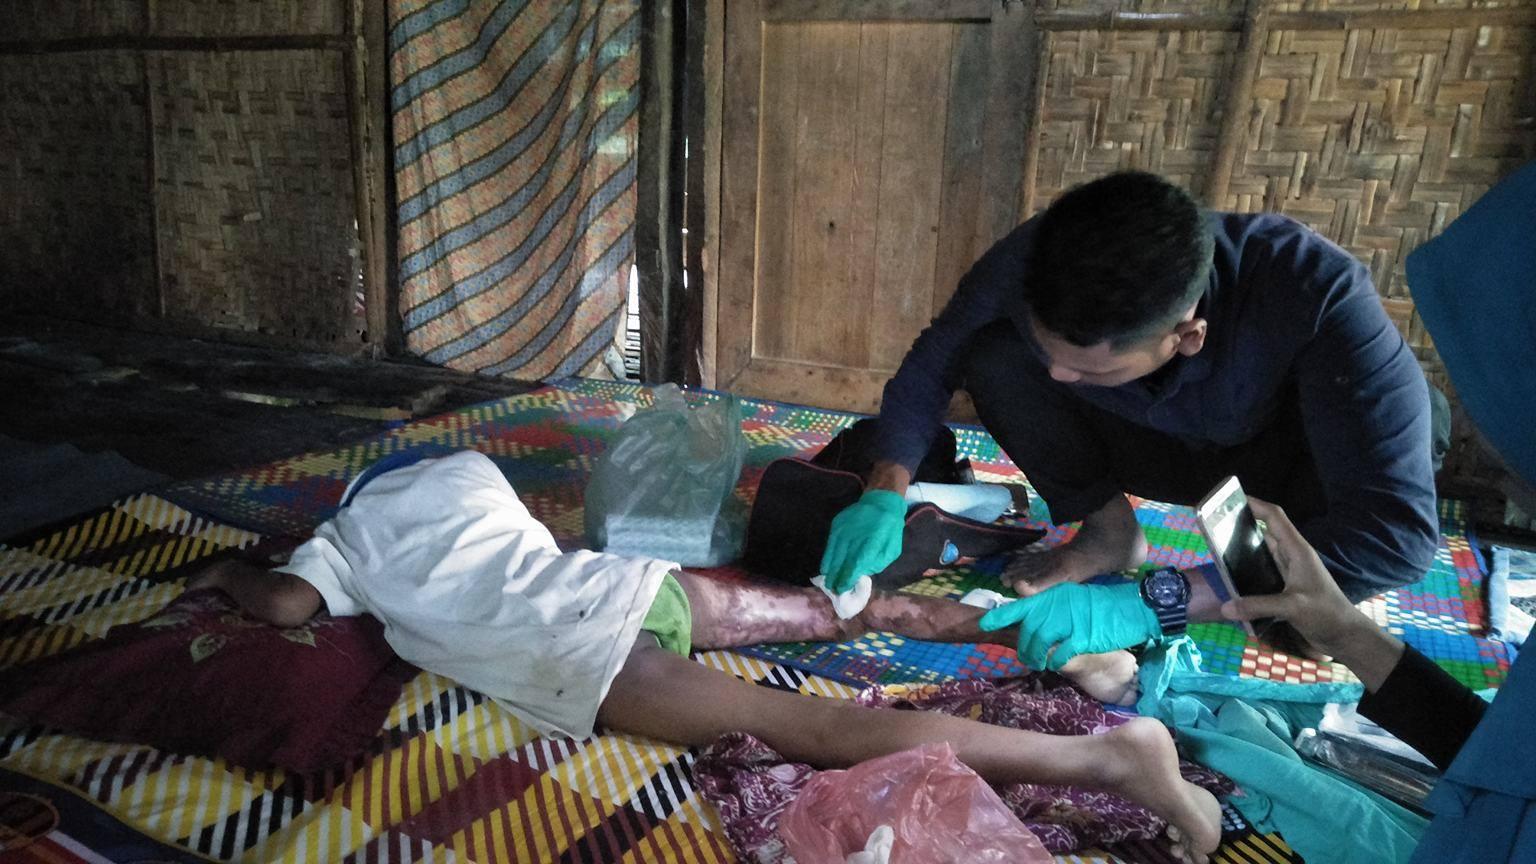 Lembaga Peduli Dhuafa Melakukan Pengobatan Tahap 2 Untuk Anak Luka Bakar dari Keluarga Tuna Netra